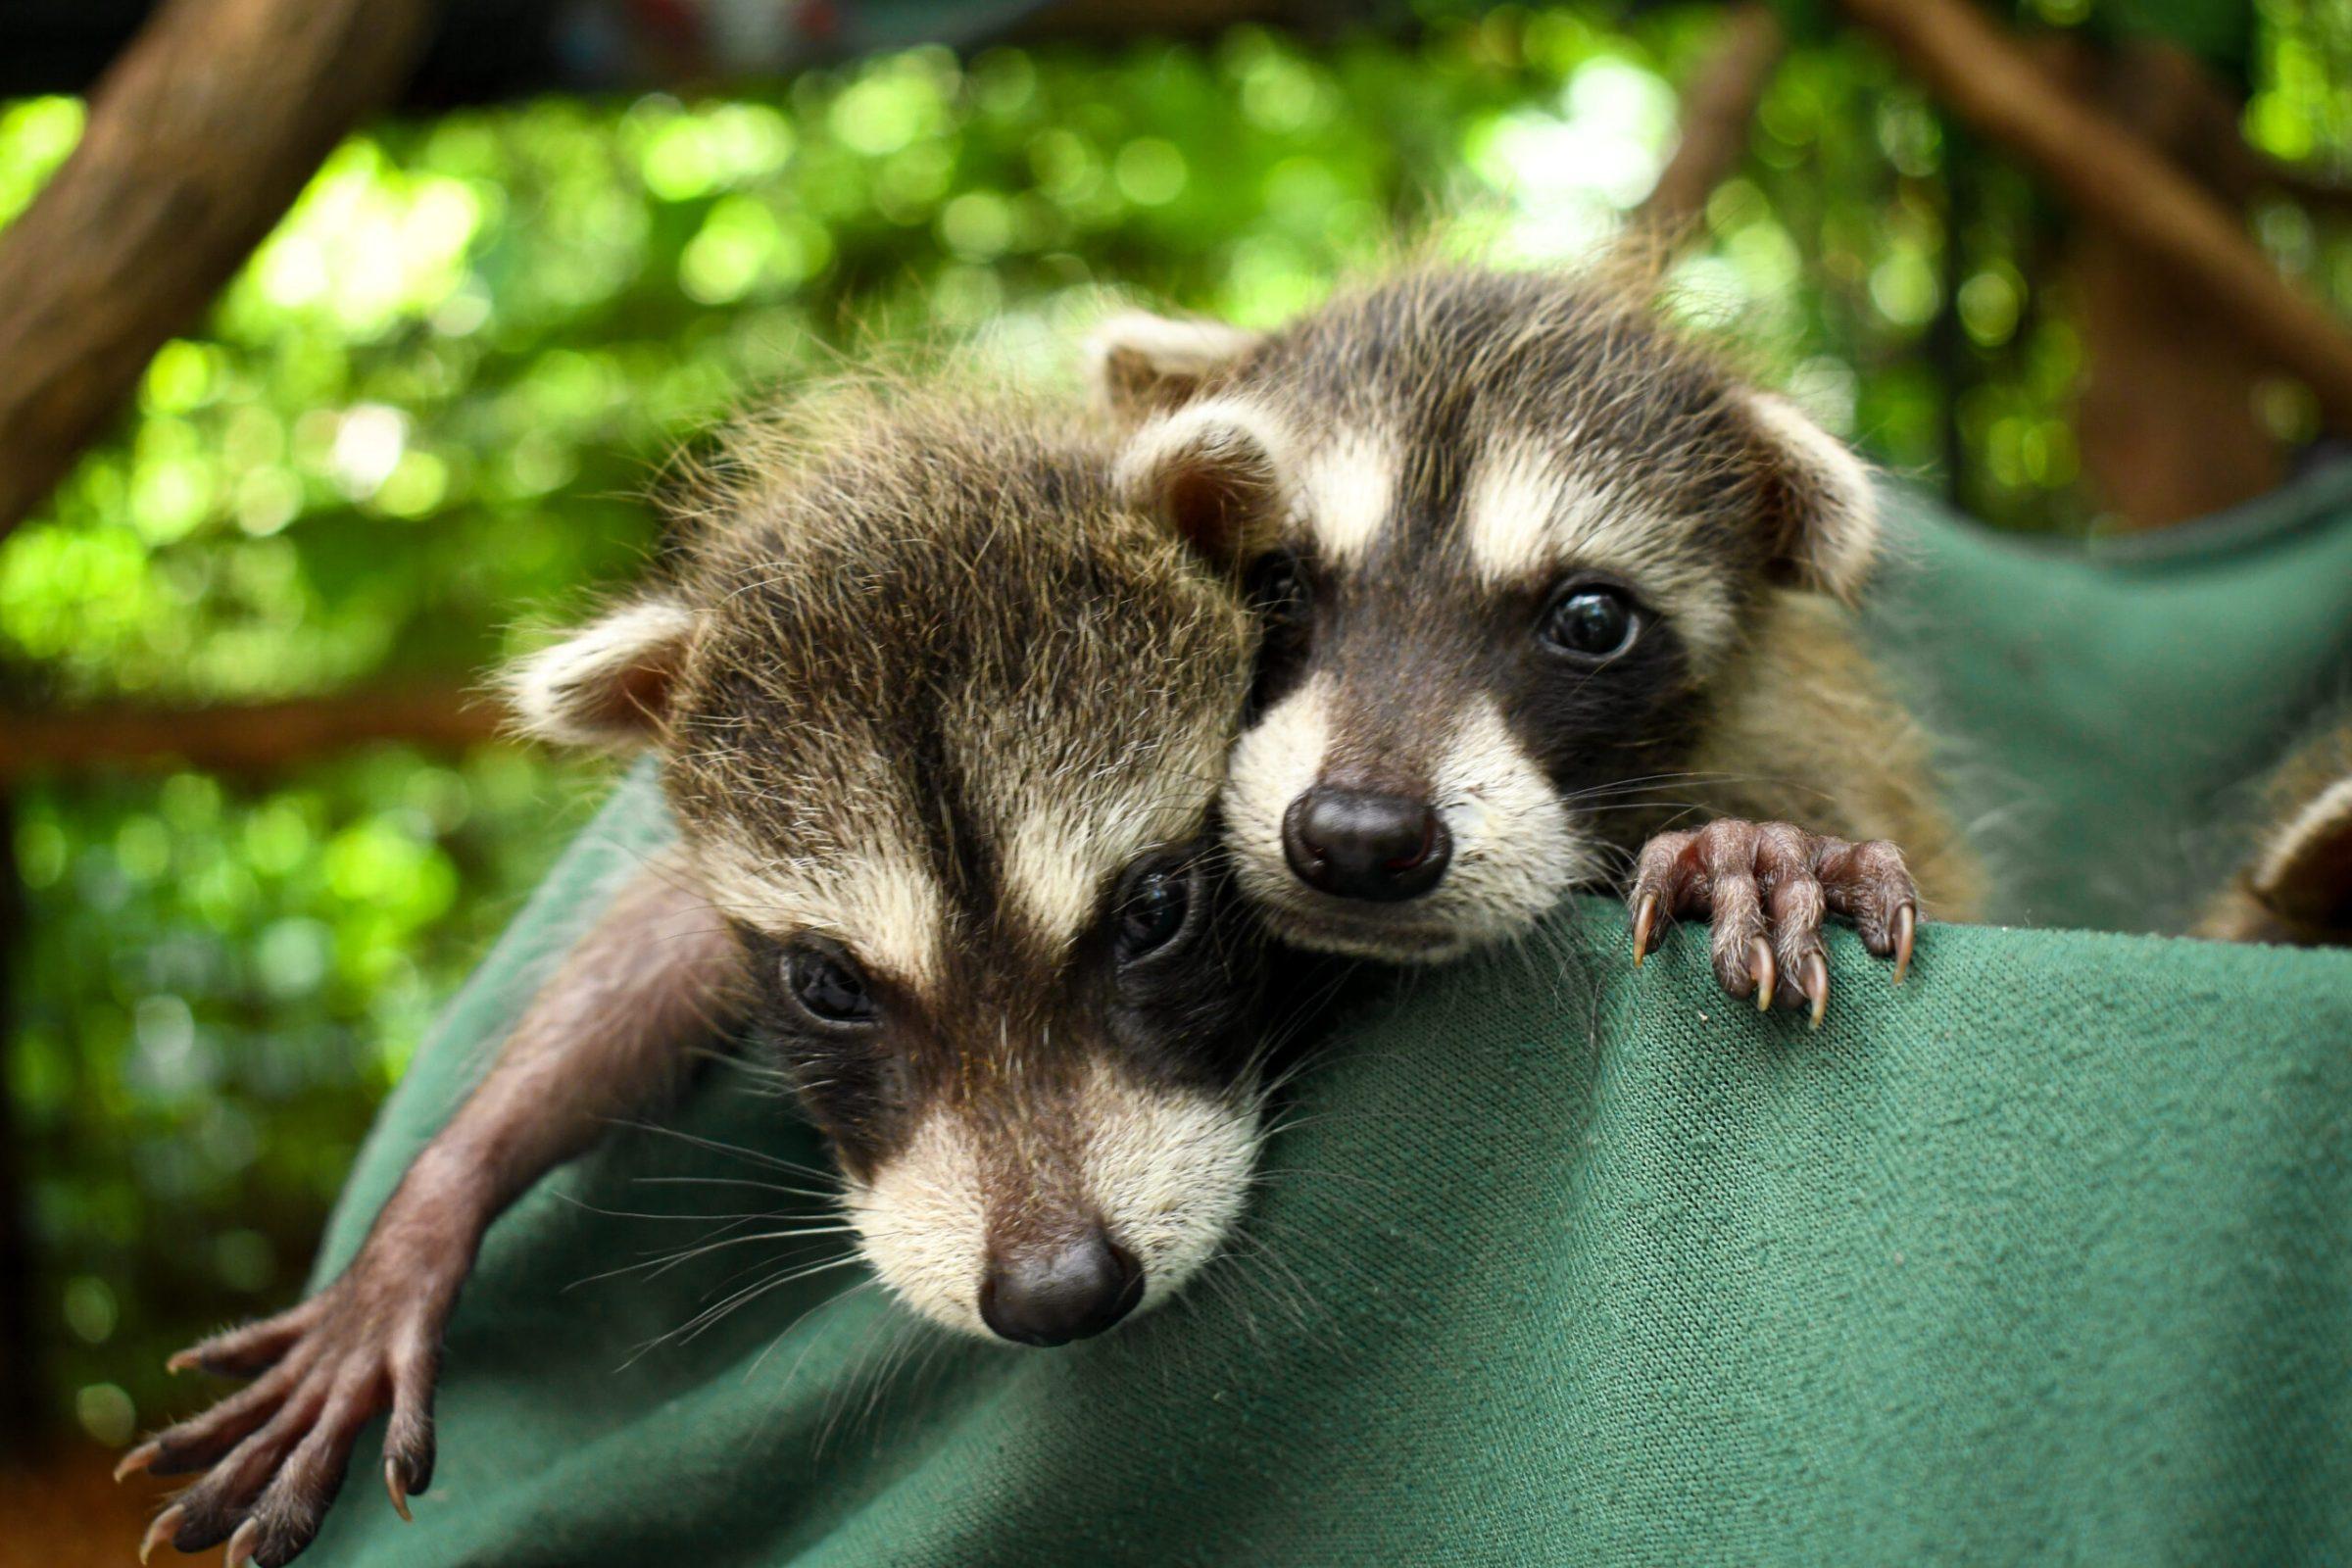 cute baby raccoons adoption rehabilitation rescue